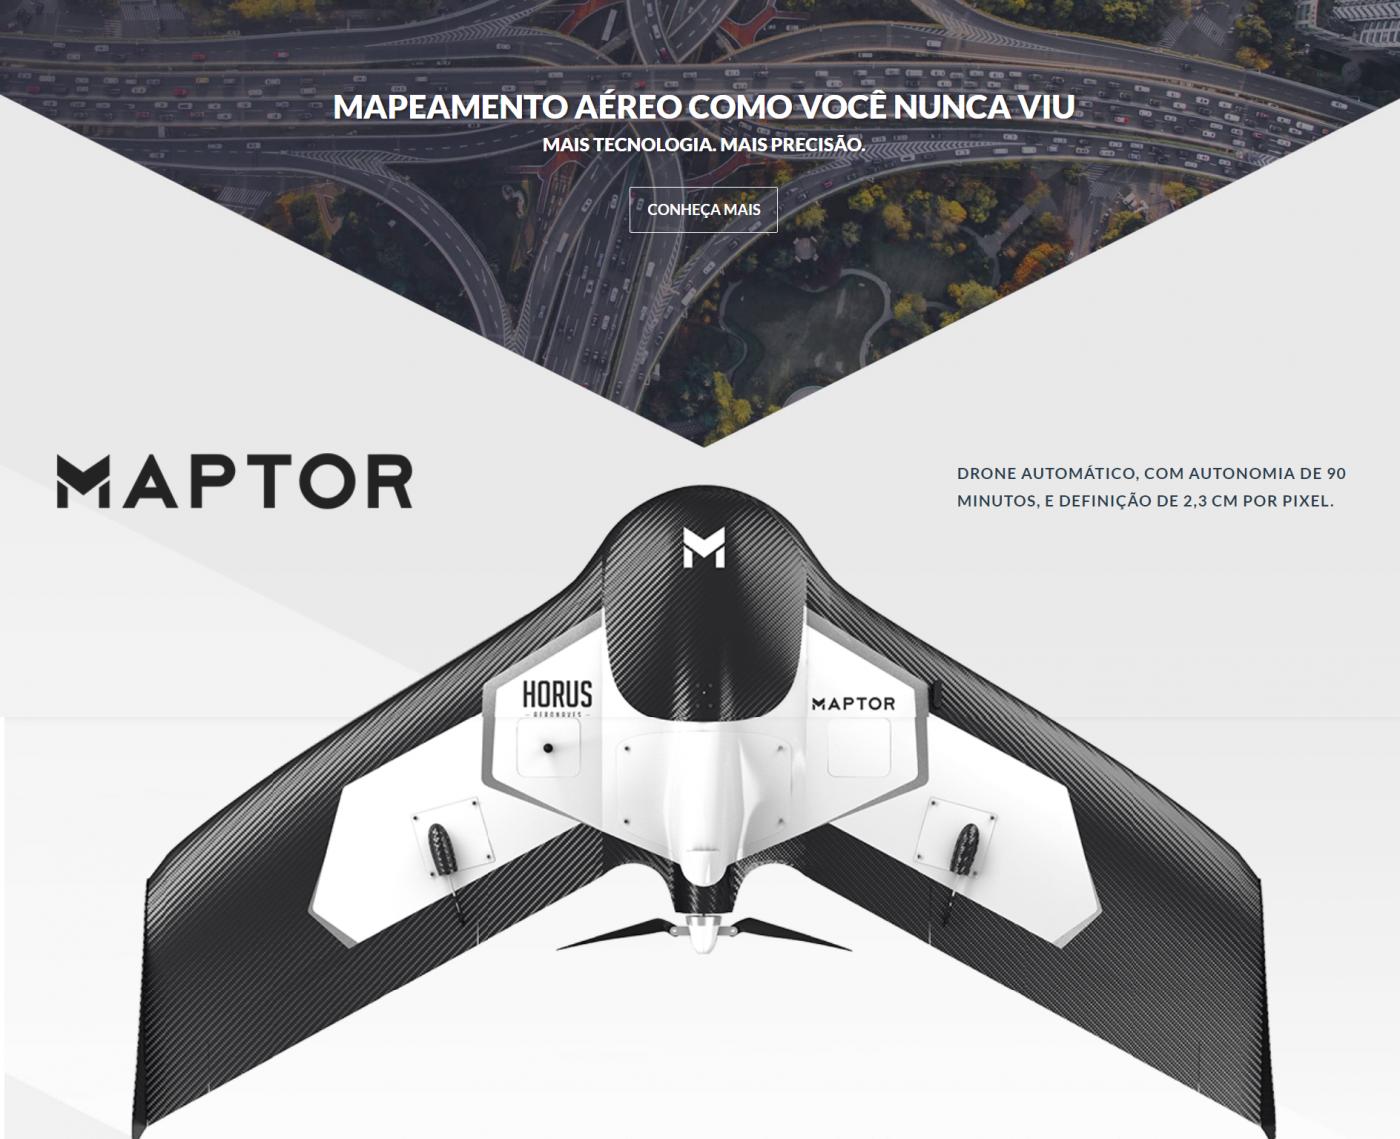 MAPTOR, MAPTOR DRONE, DRONE ASA FIXA, ASA FIXA MAPTOR,